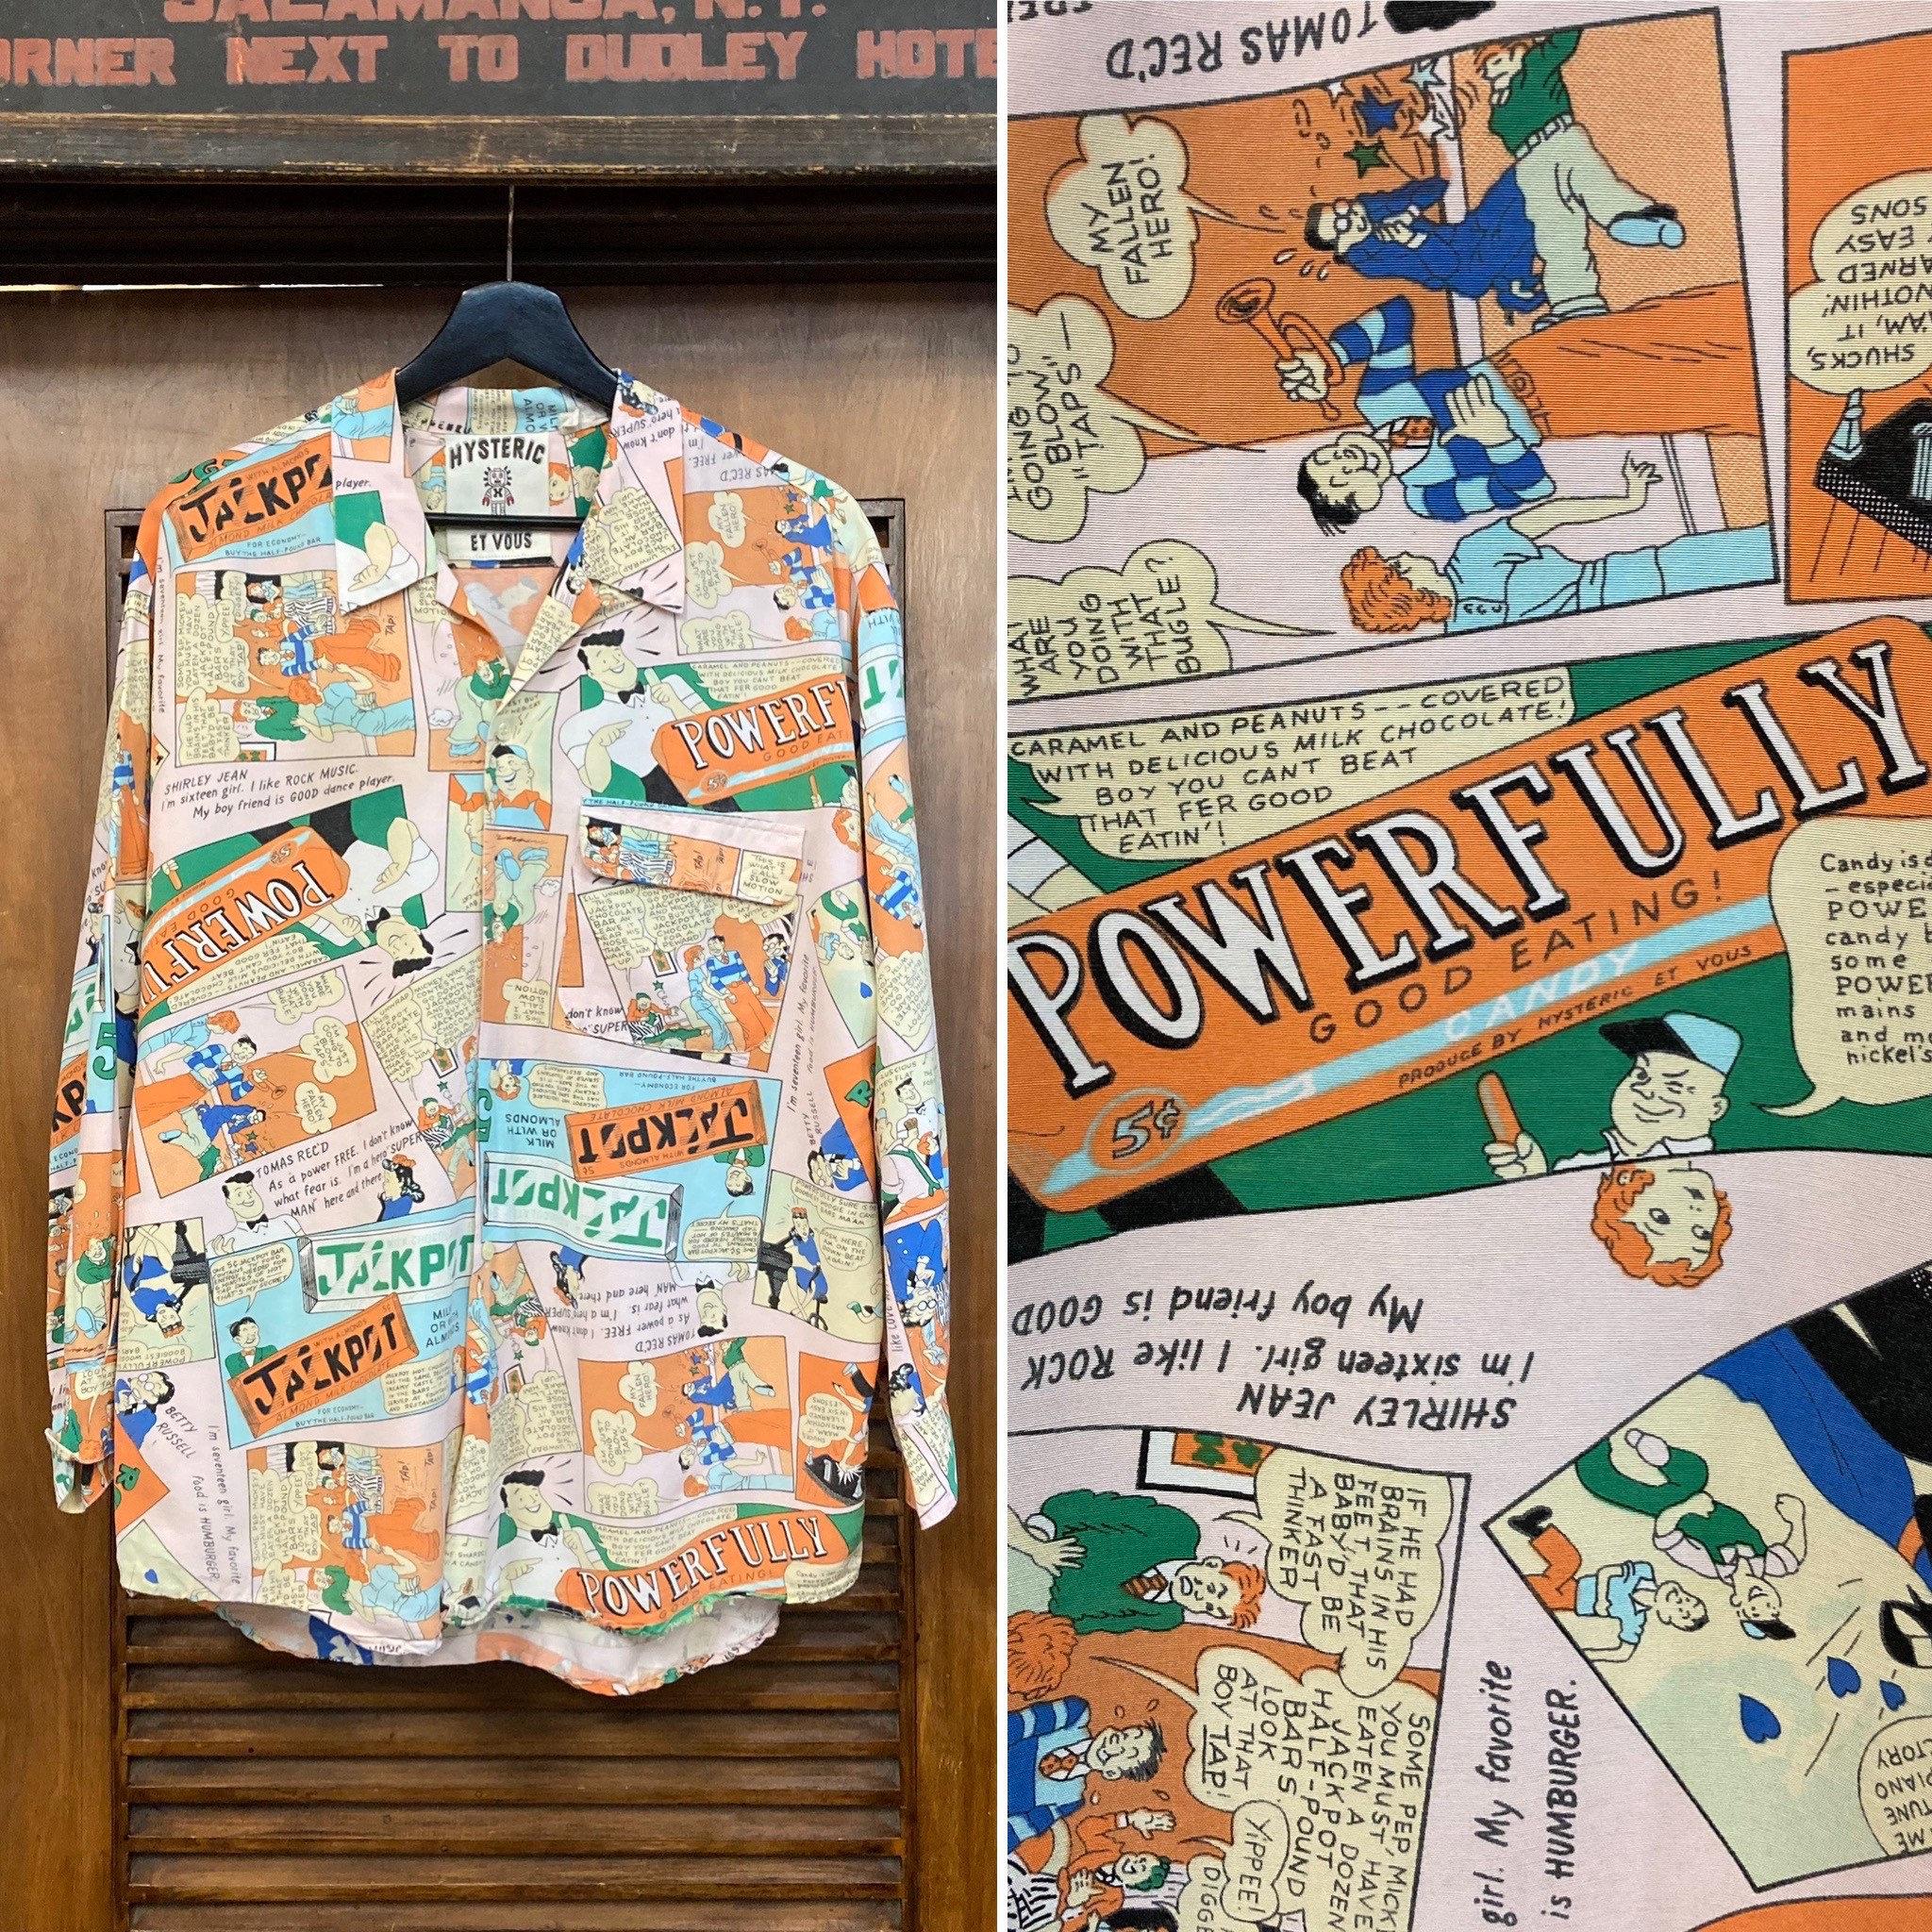 80s Tops, Shirts, T-shirts, Blouse   90s T-shirts Vintage 1980s Comic Book Cartoon Print New Wave Shirt, 80s Print, Comix, Style, Clothing $250.00 AT vintagedancer.com